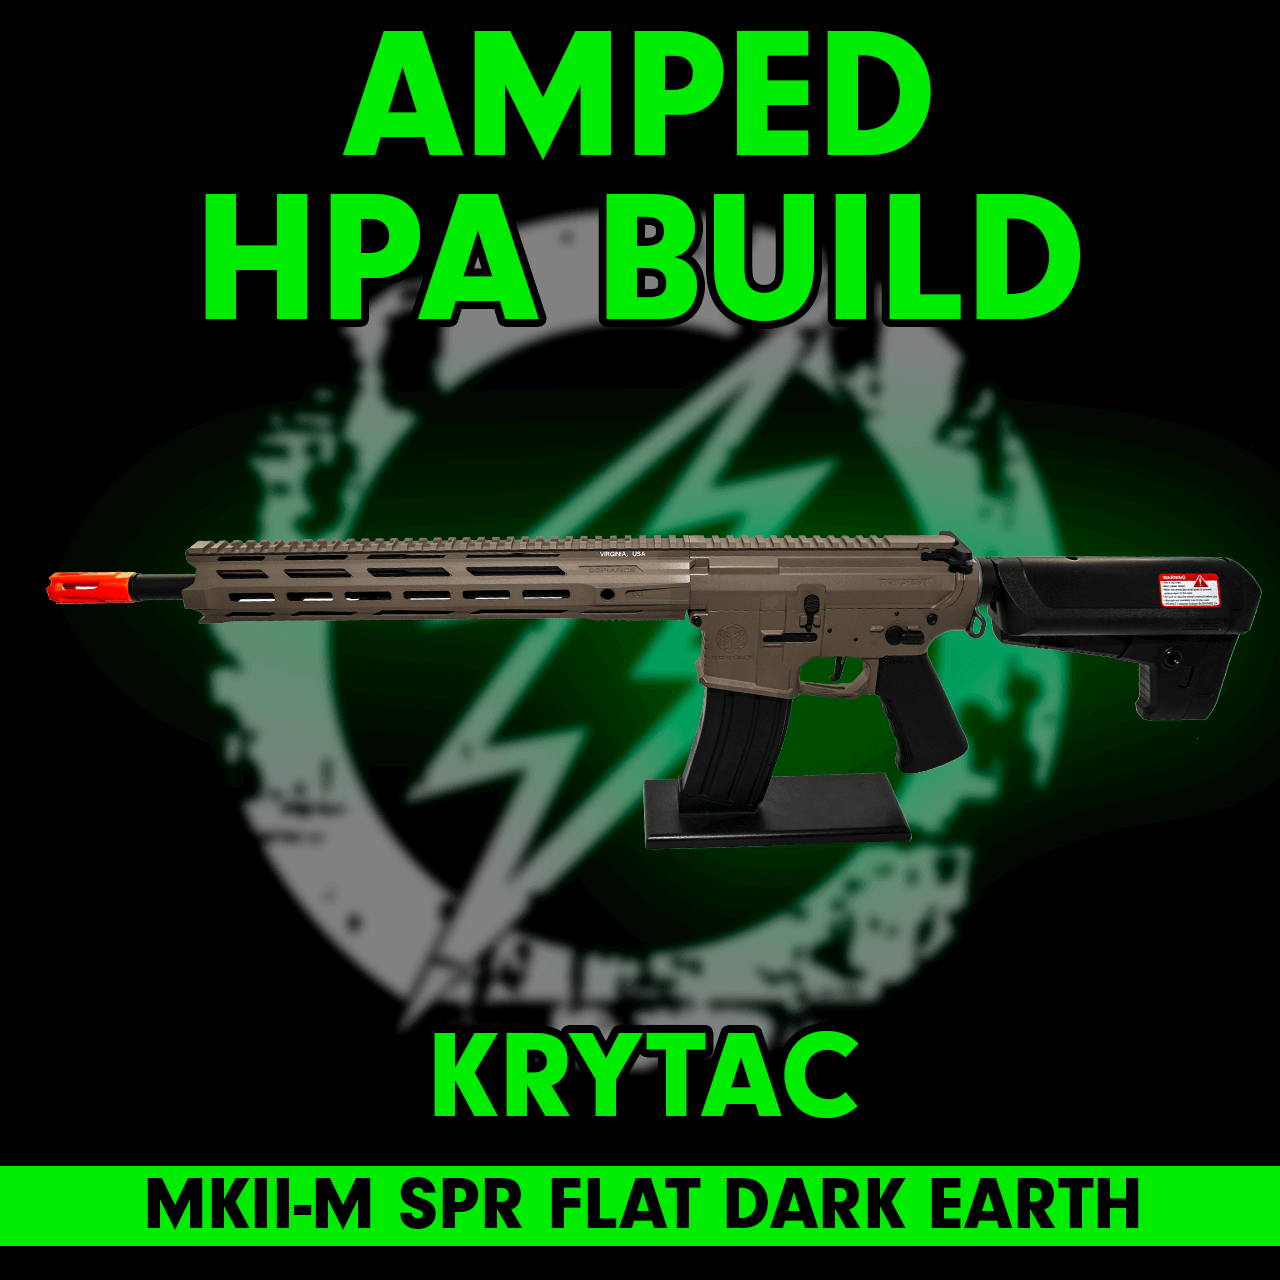 Amped Custom HPA Rifle Krytac MKII-M SPR | Flat Dark Earth